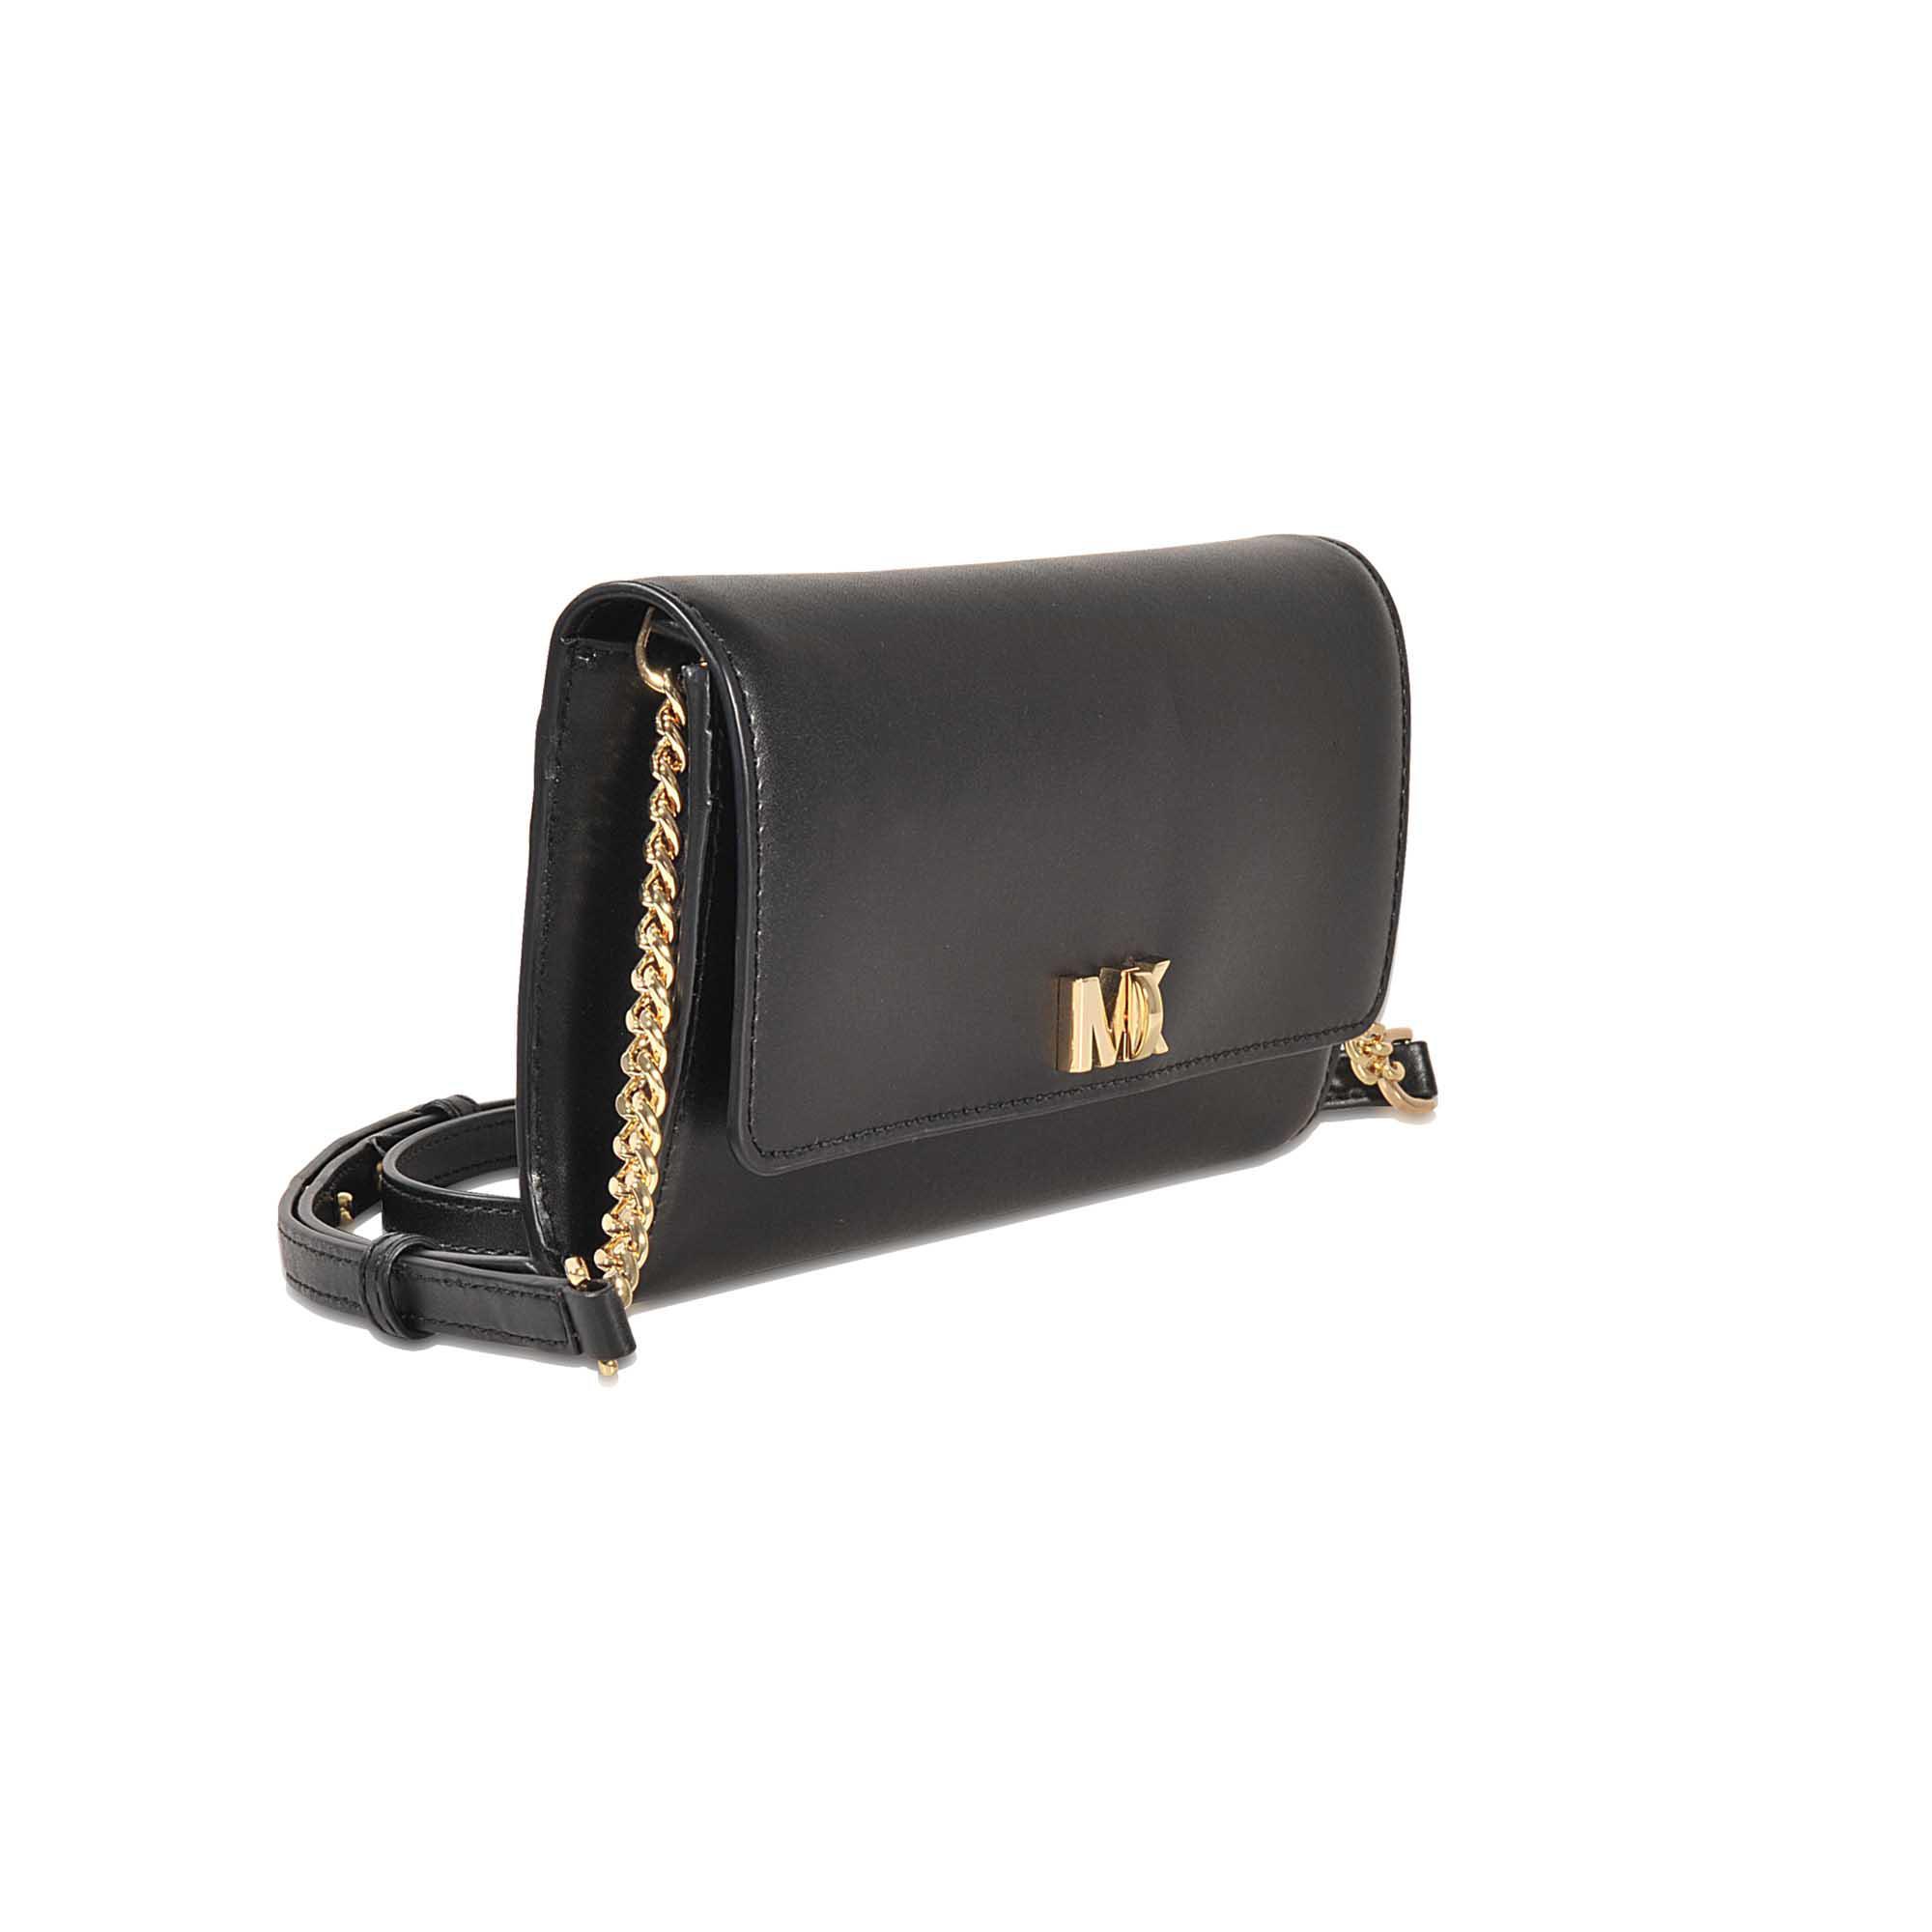 9bfb5264a2dcd Lyst - MICHAEL Michael Kors Mott Xl Wallet Clutch in Black